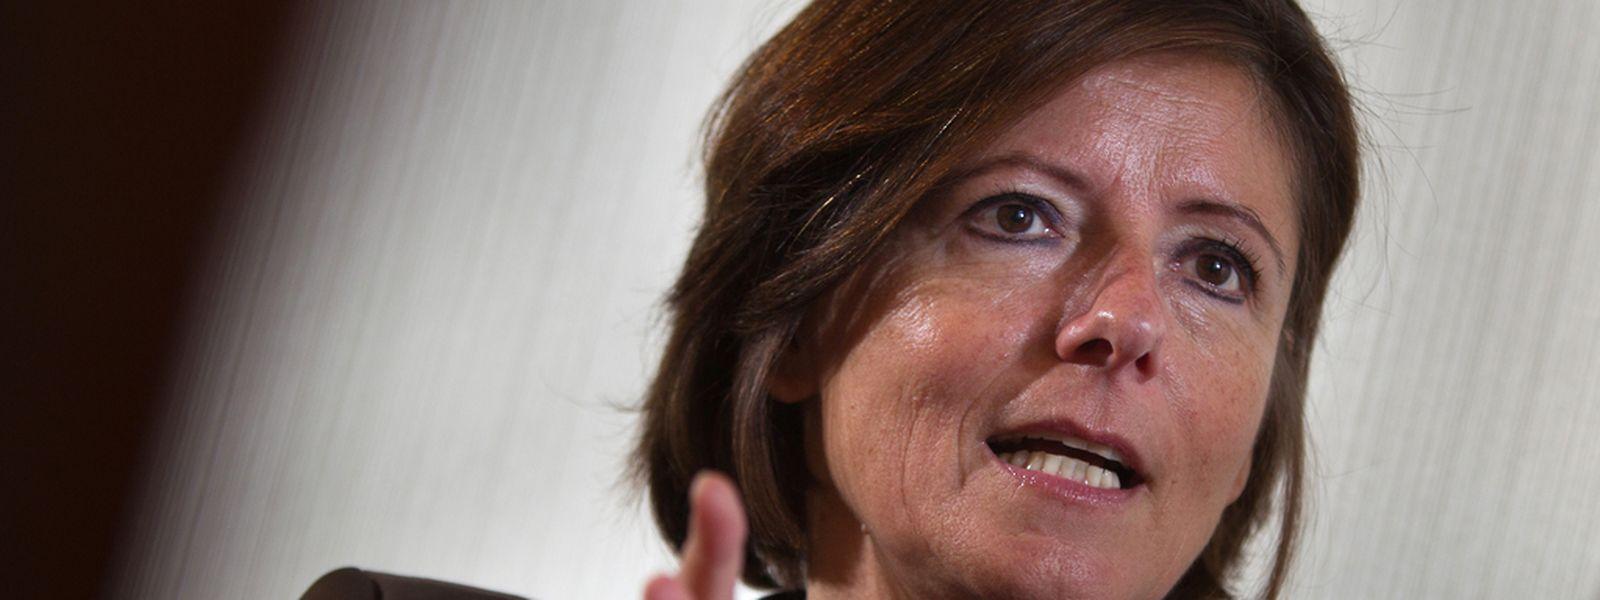 ITV Ministerpräsidentin Rheinland-Pfalz Malu Dreyer.Foto:Gerry Huberty